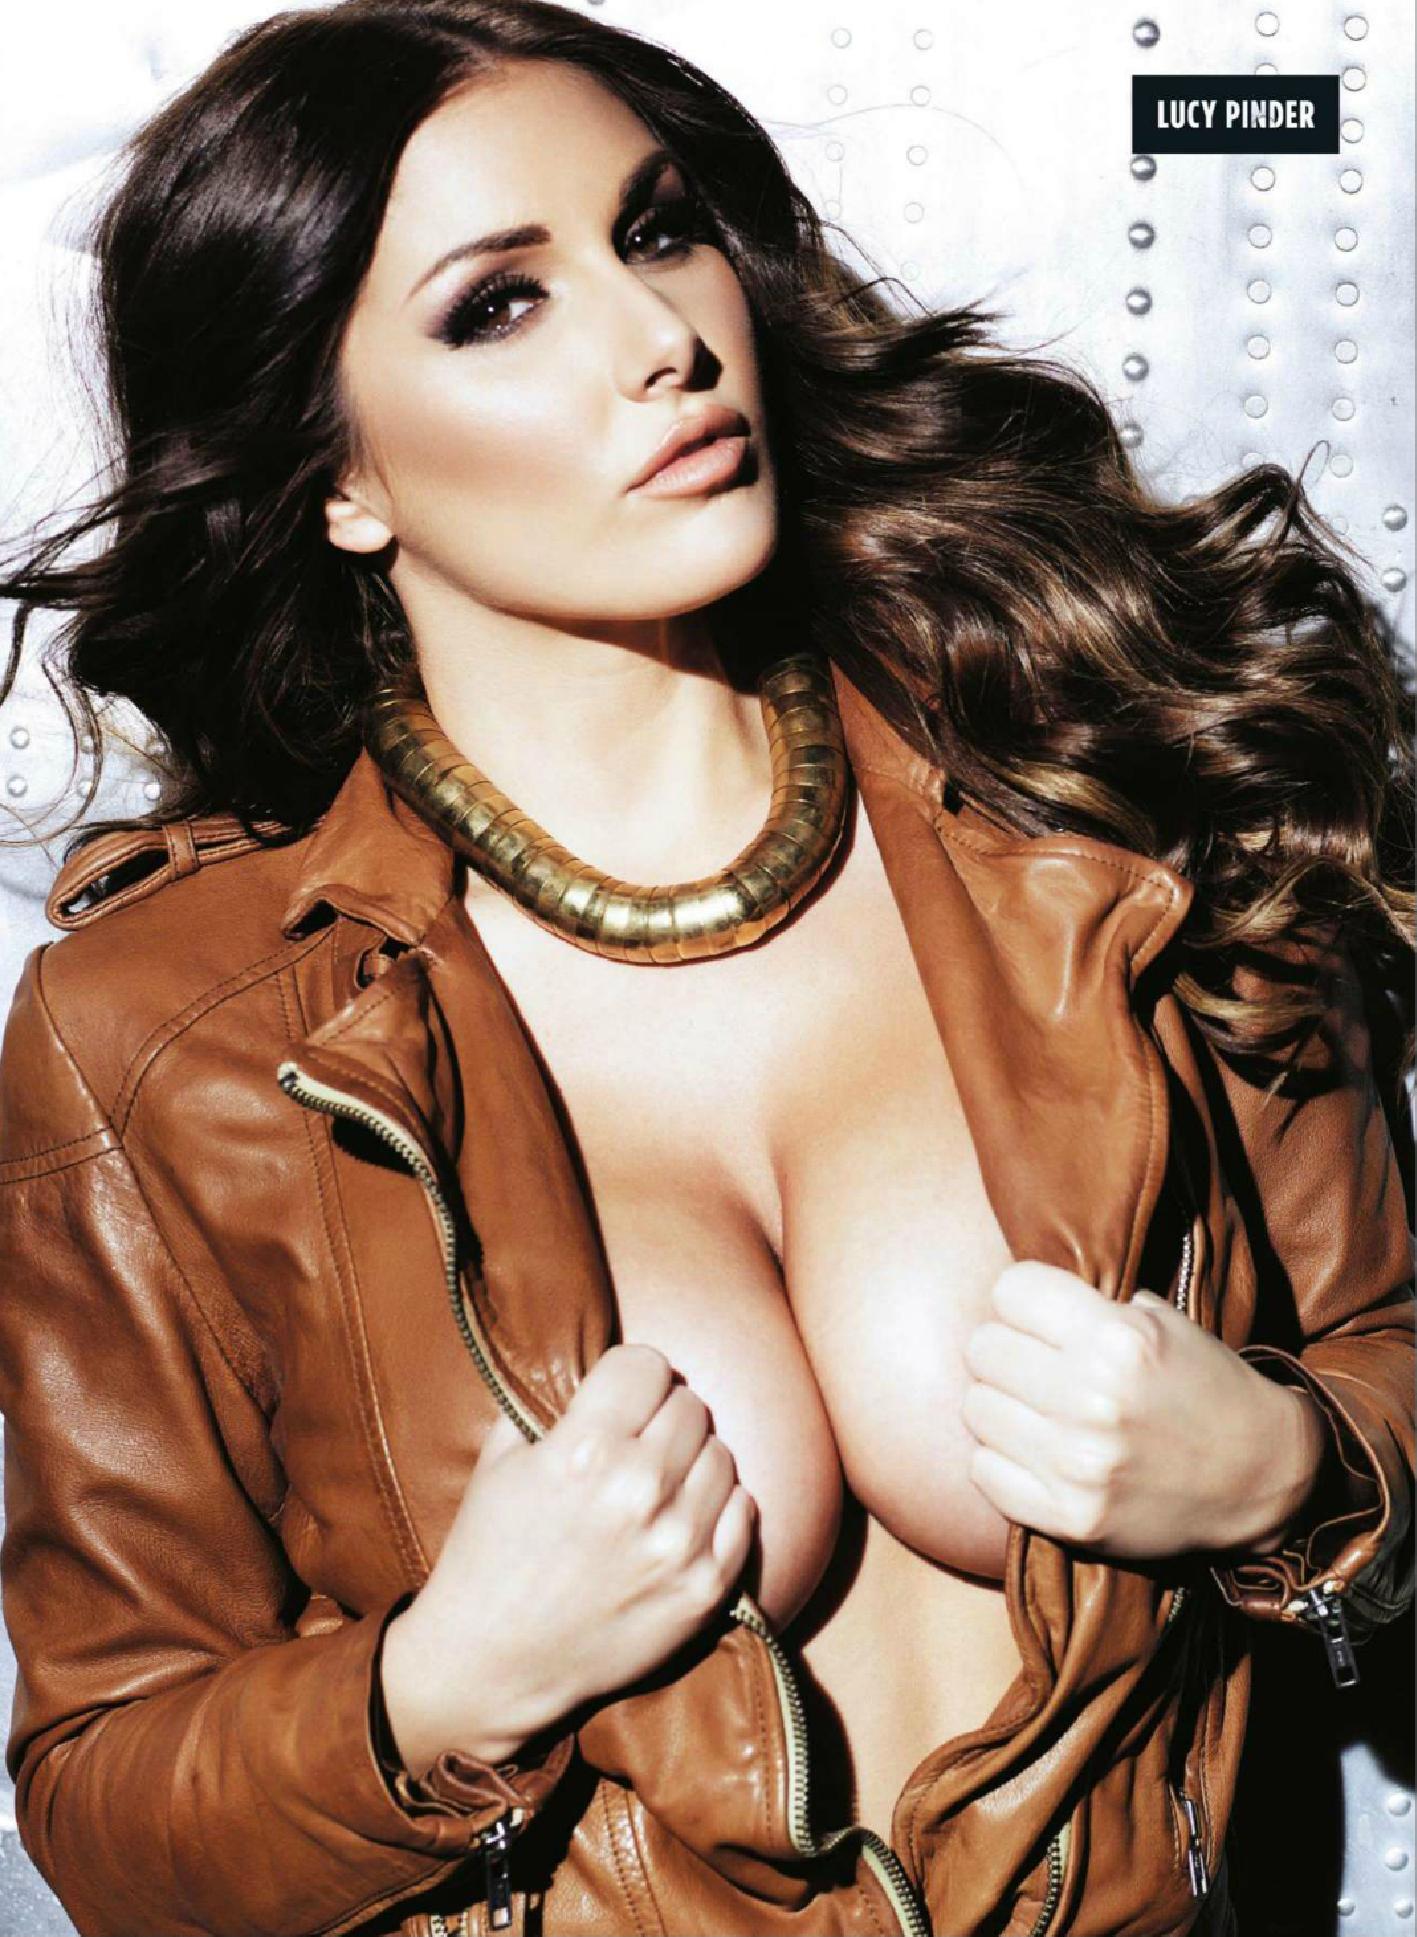 Lucy Pinder Magazine Nuts nue Novembre 2013 04